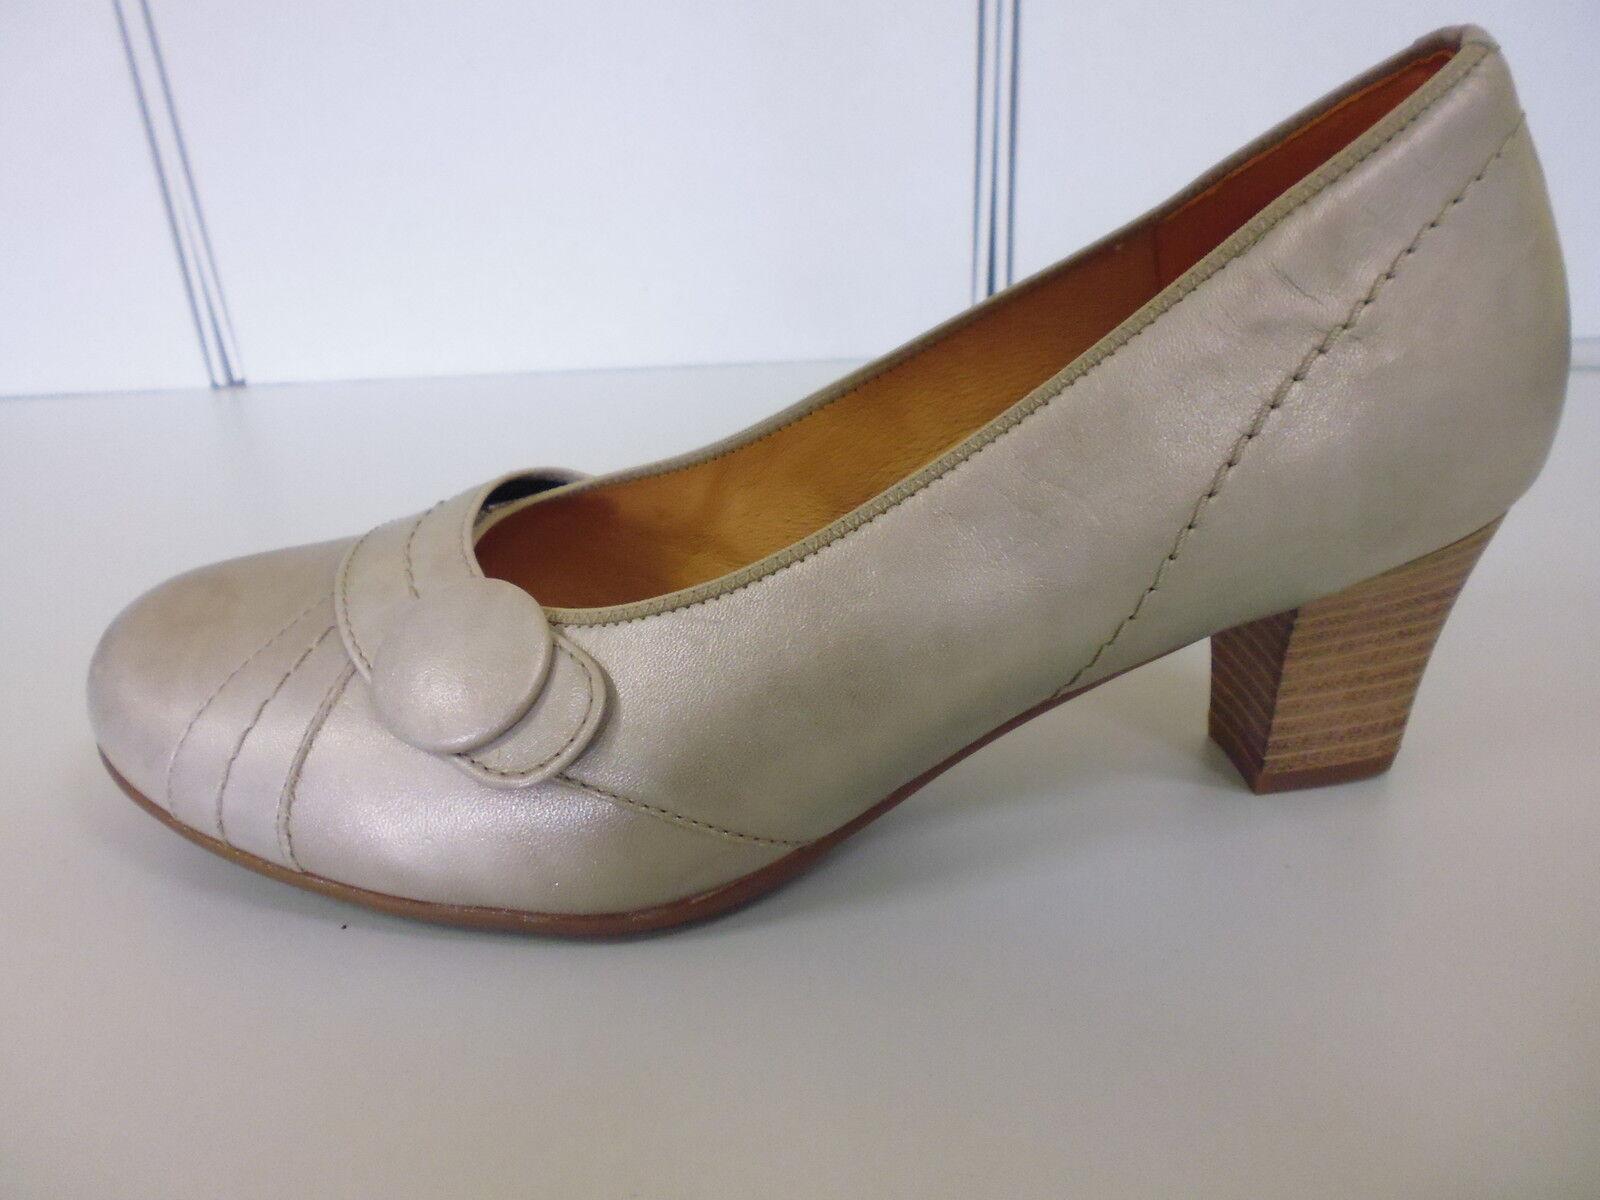 Gran descuento Zapatos señora zapatos mocasines pumps cuero de Theresia Naot (5,5) WH